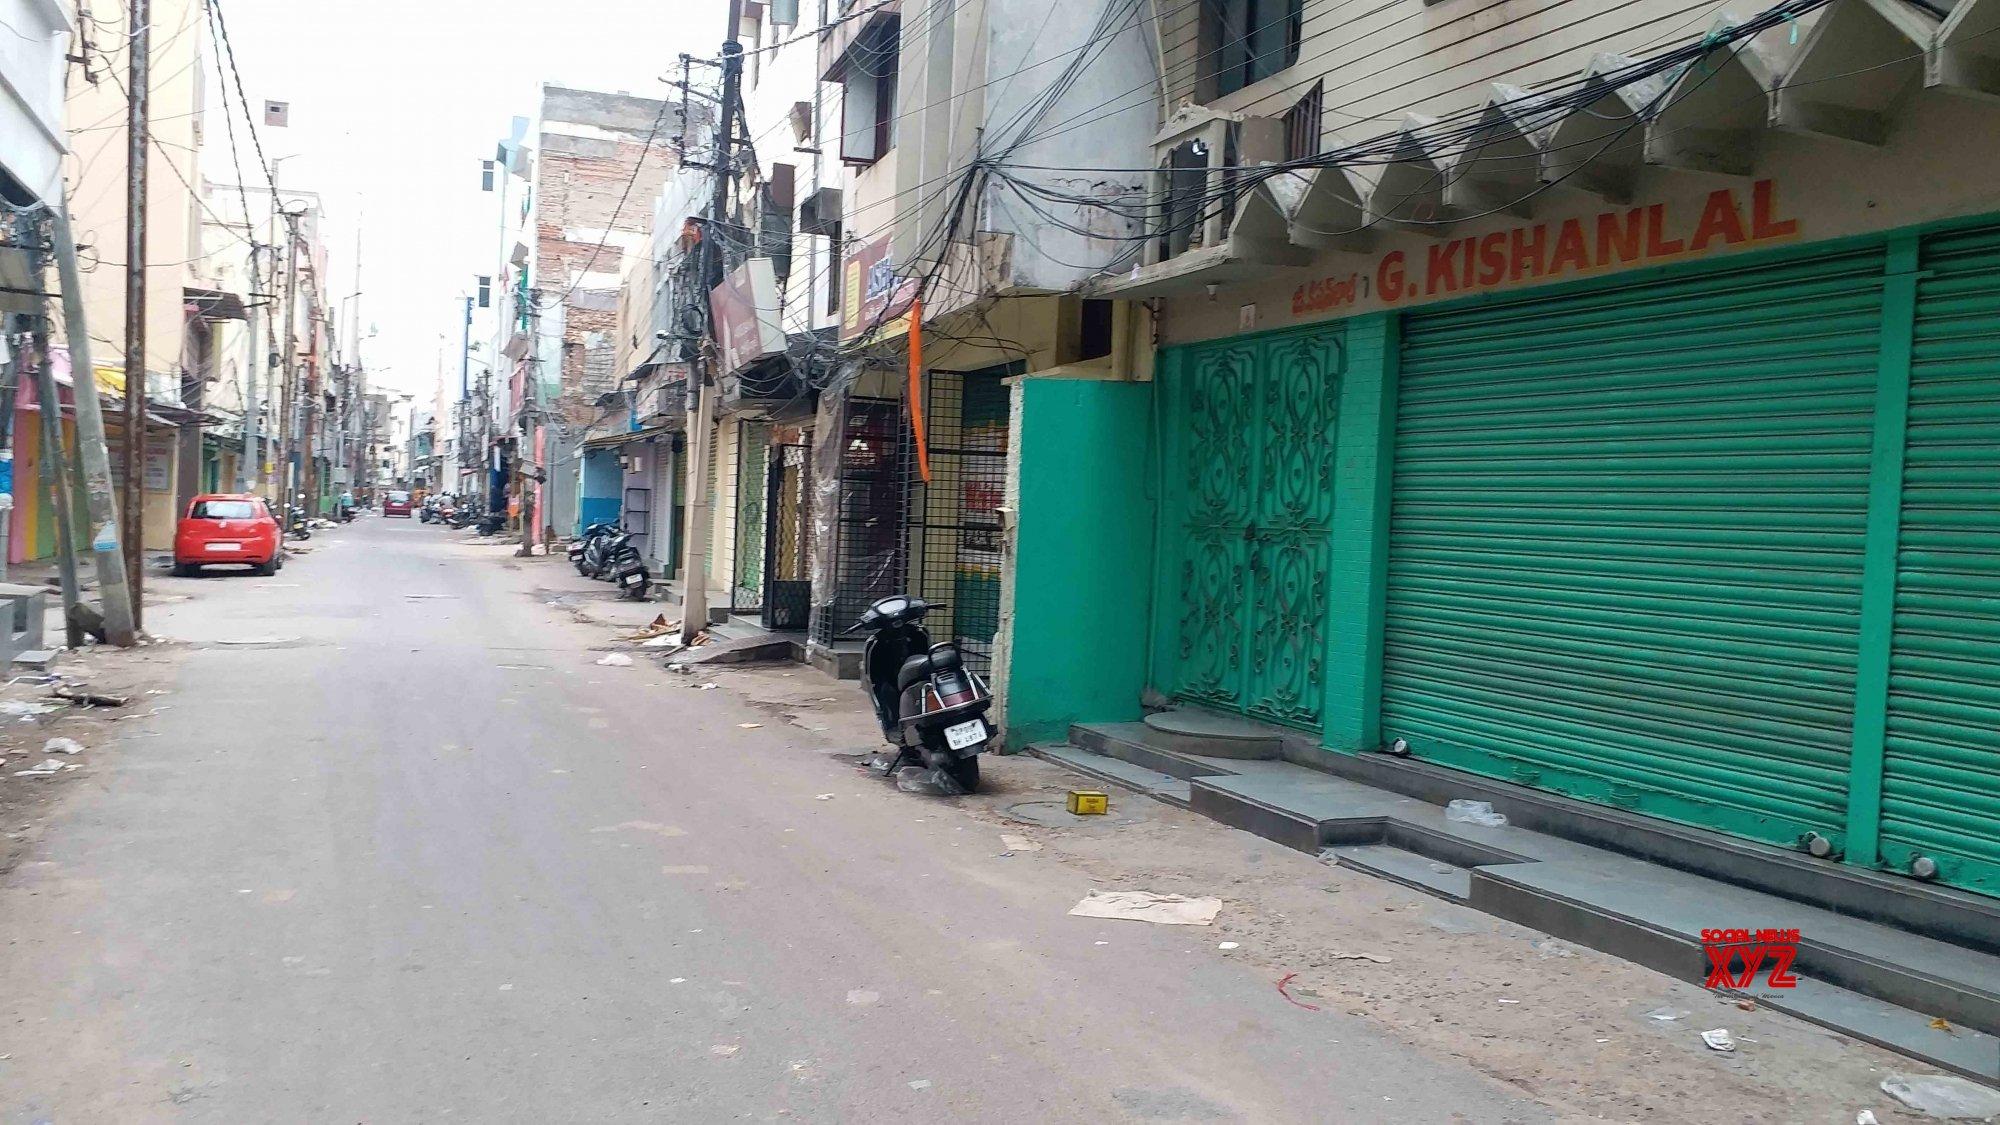 Covid Hit: India's macros paint grim economic picture